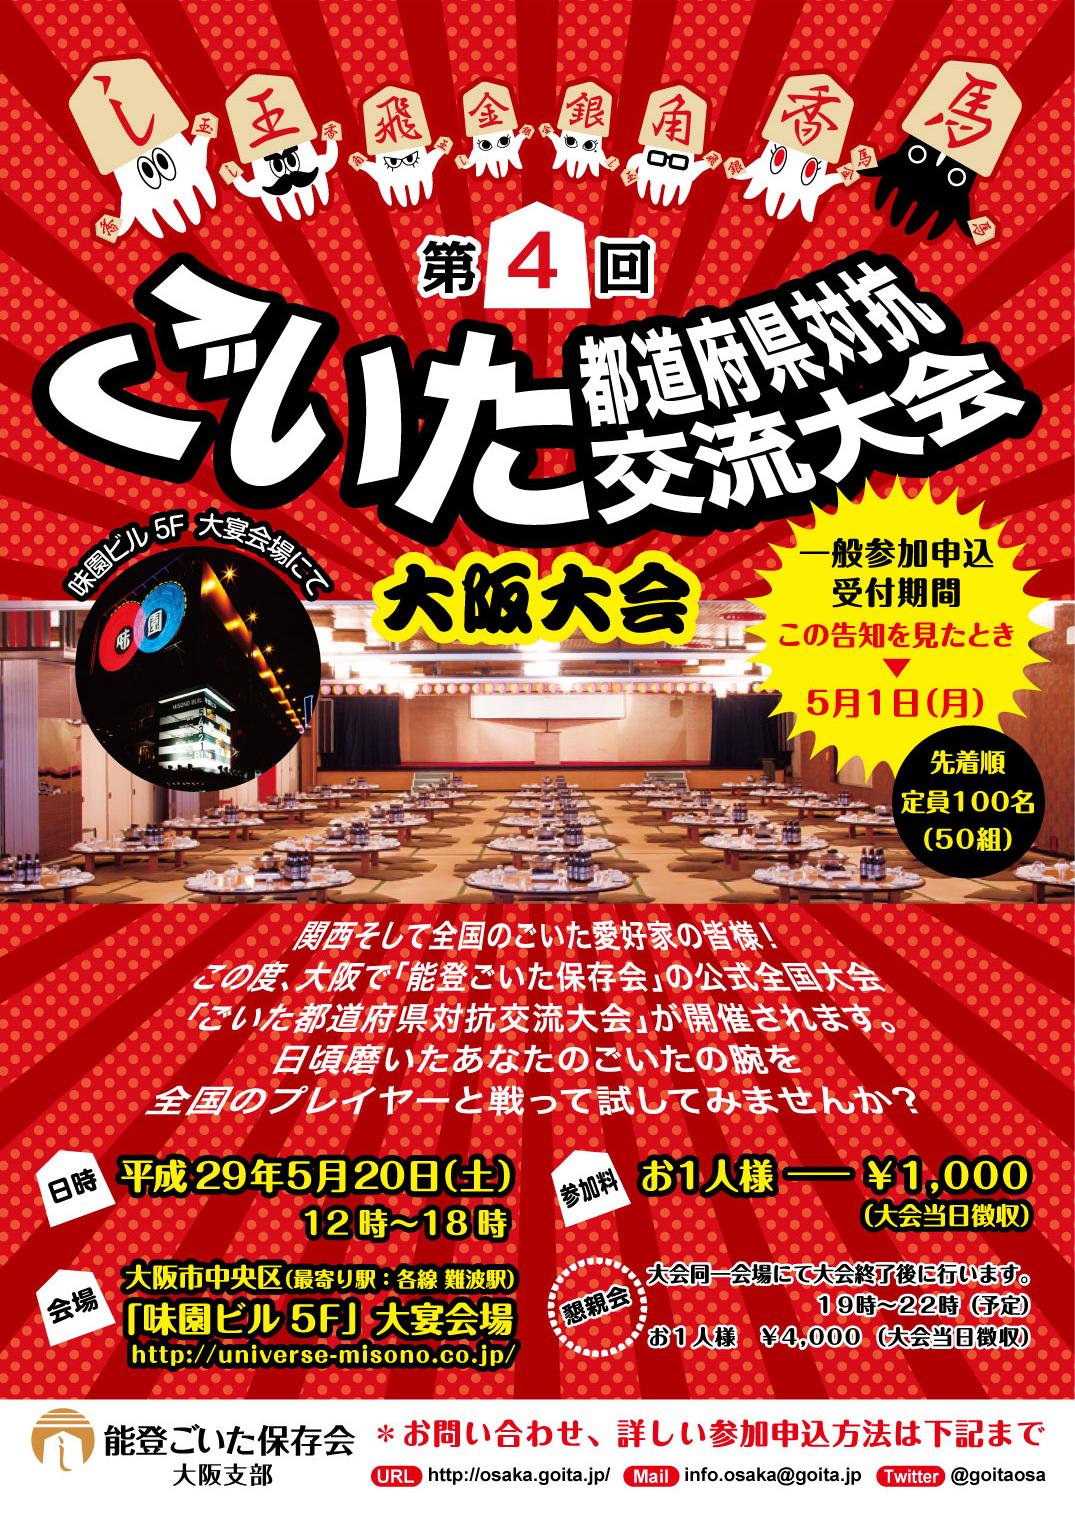 第4回 ごいた都道府県対抗交流大会・大阪大会